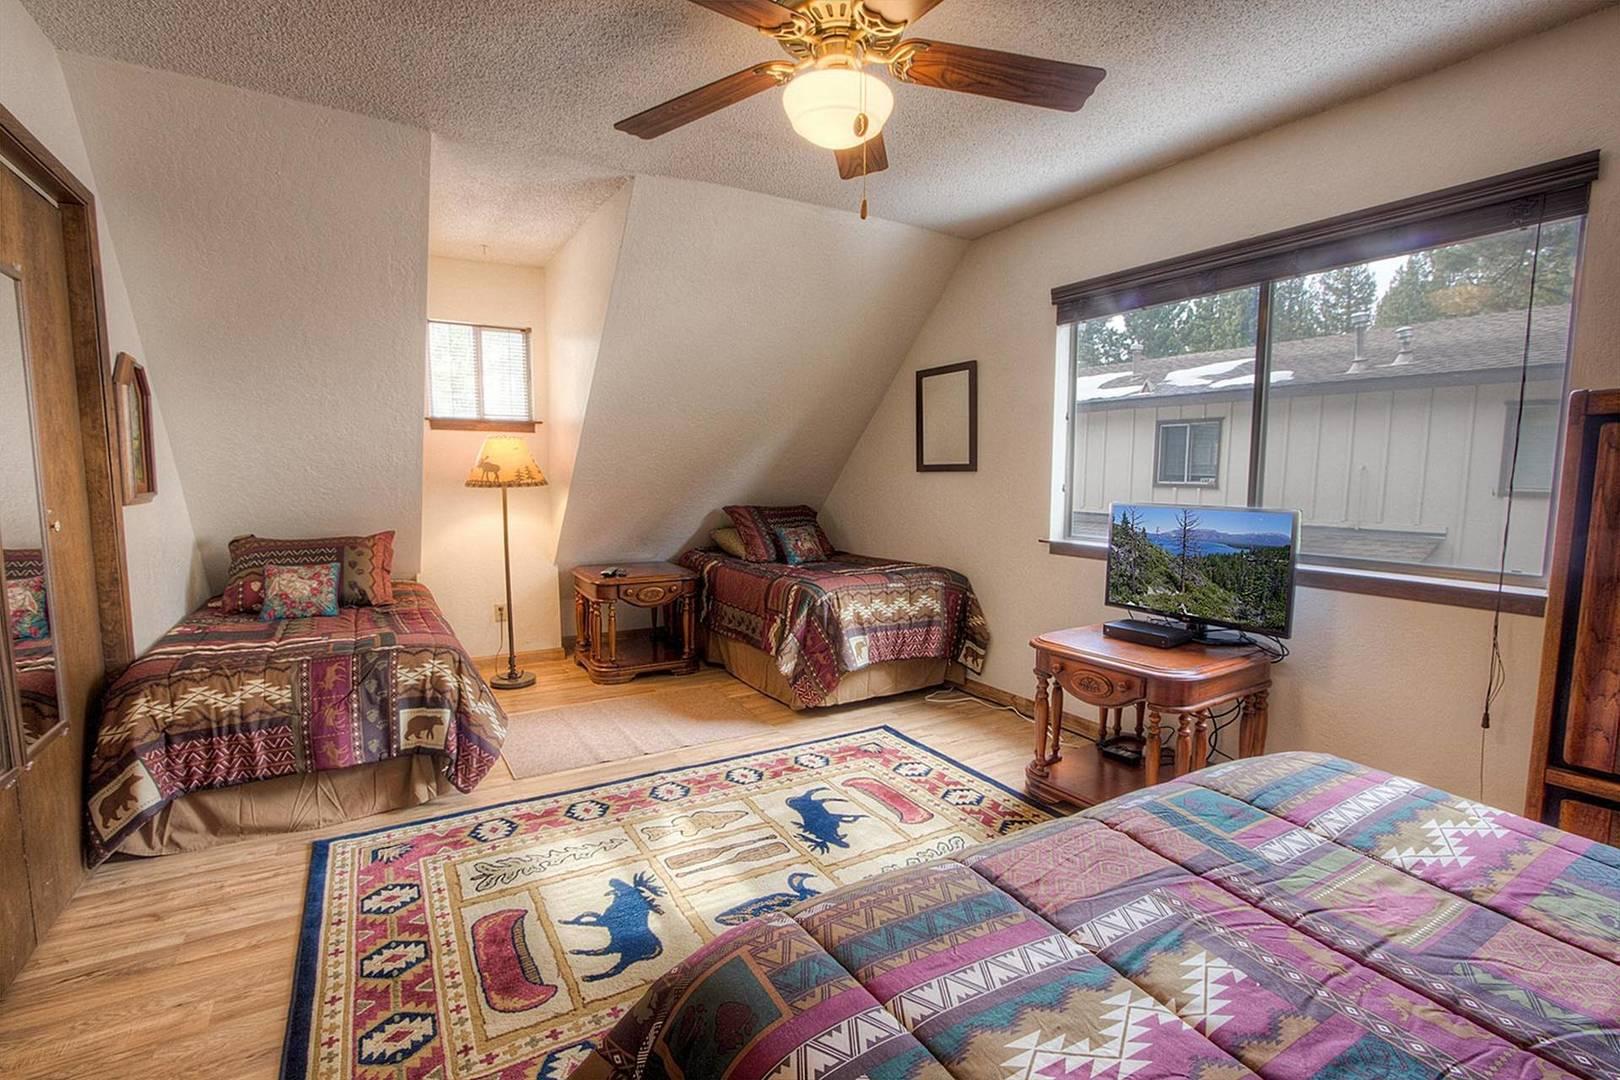 cyh1201 bedroom